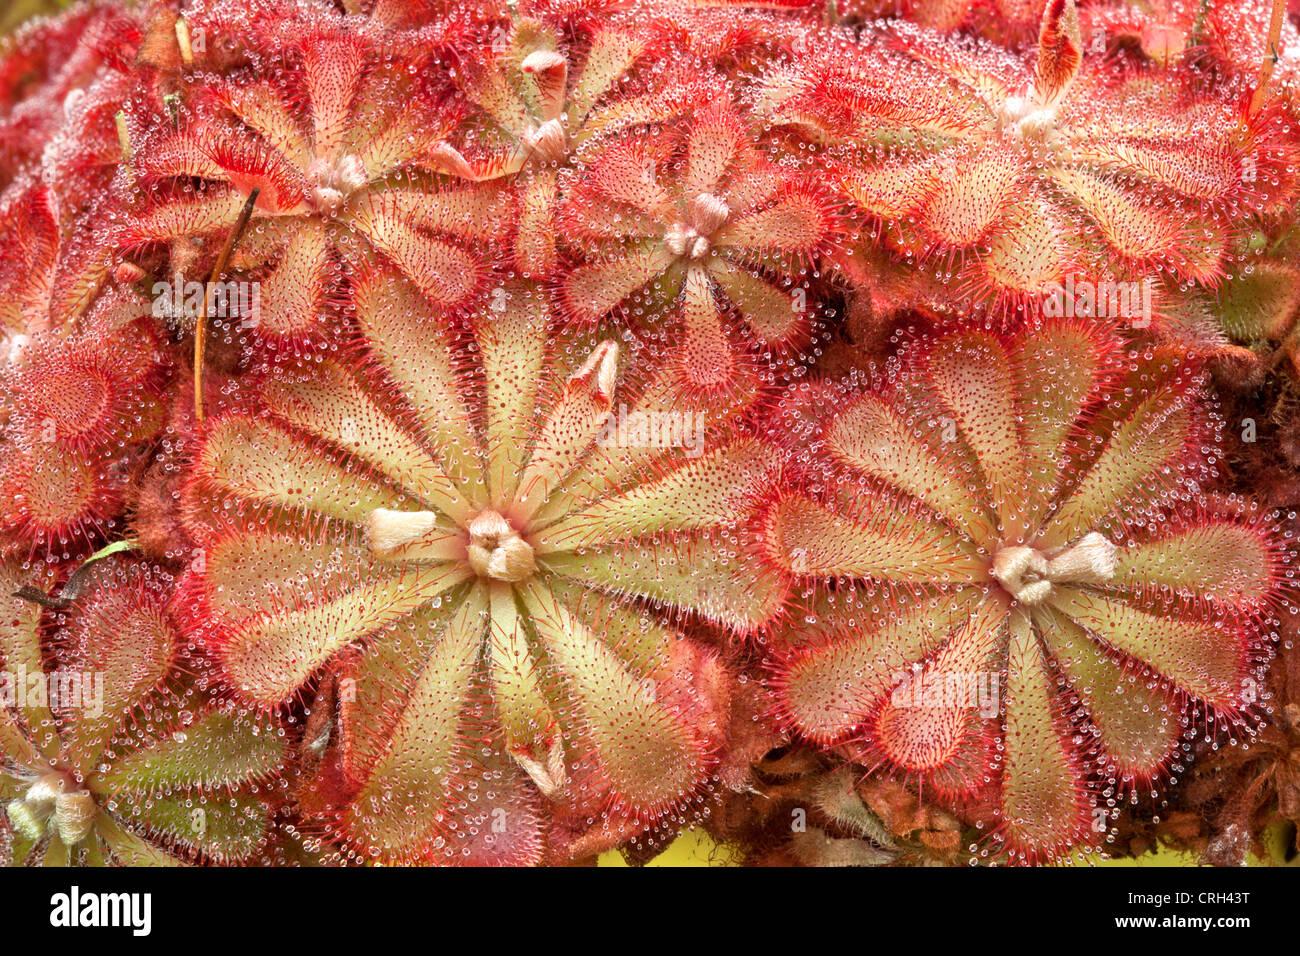 Drosera Sundew growing, carnivorous plant. - Stock Image